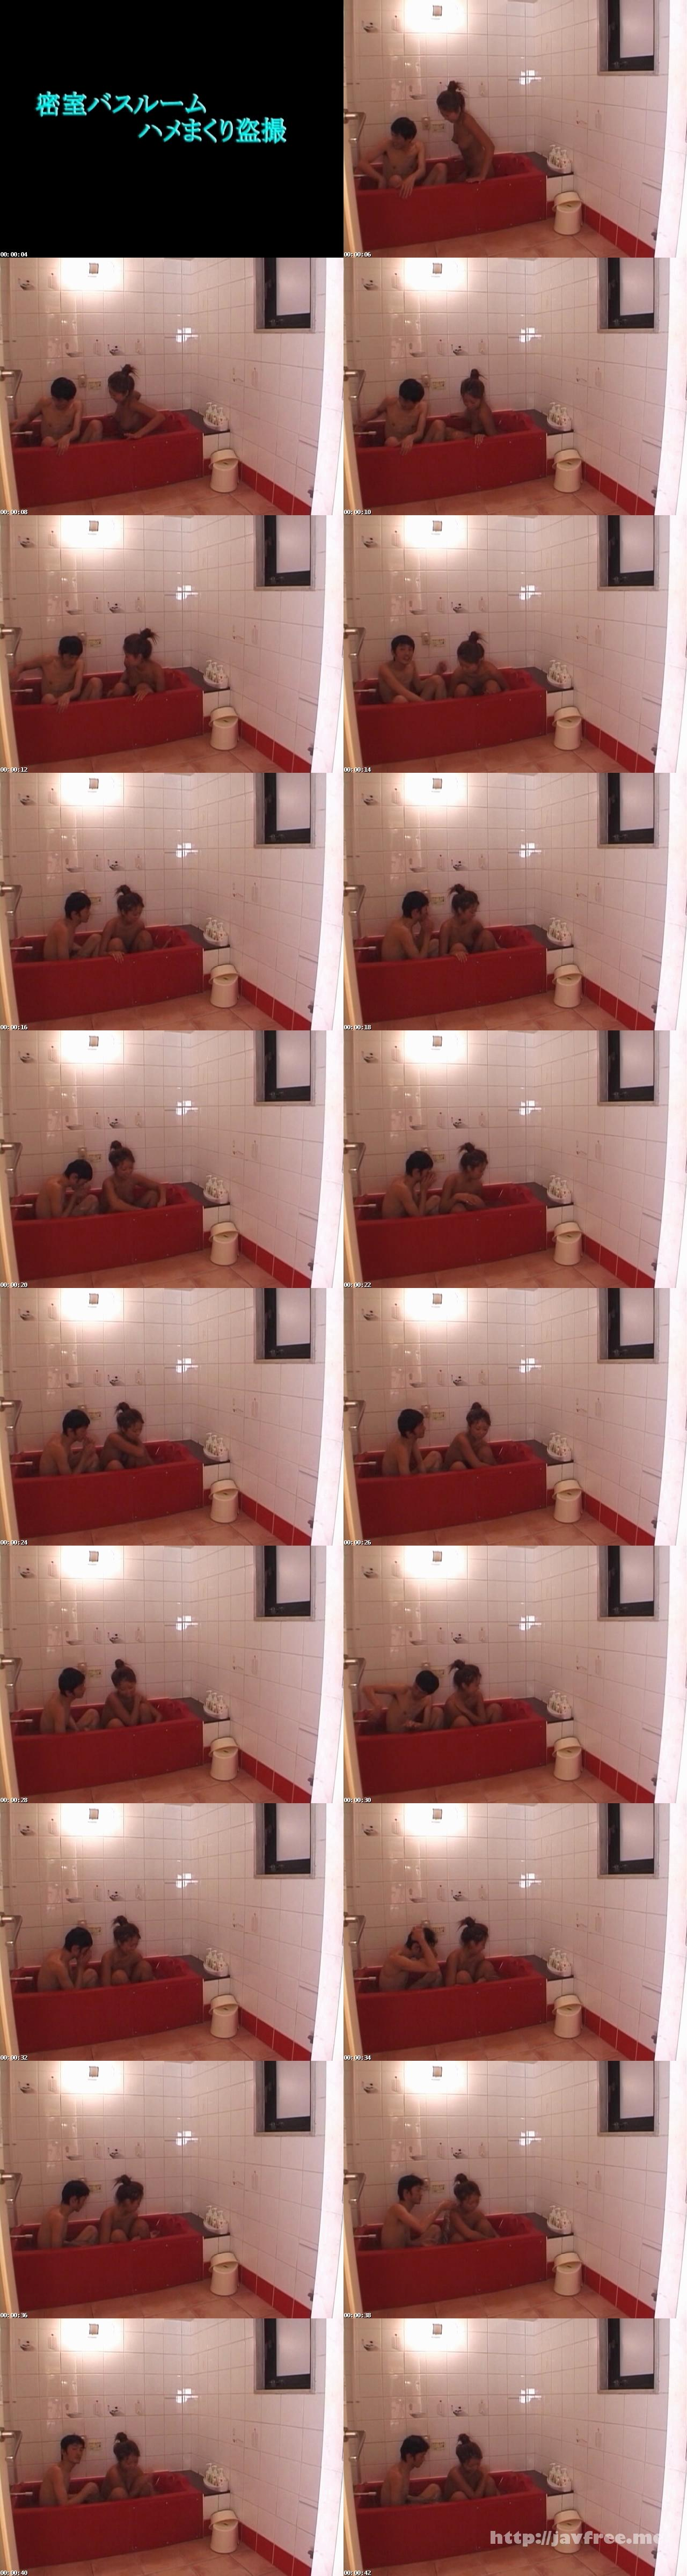 [CURO-291] 密室バスルームハメまくり盗撮